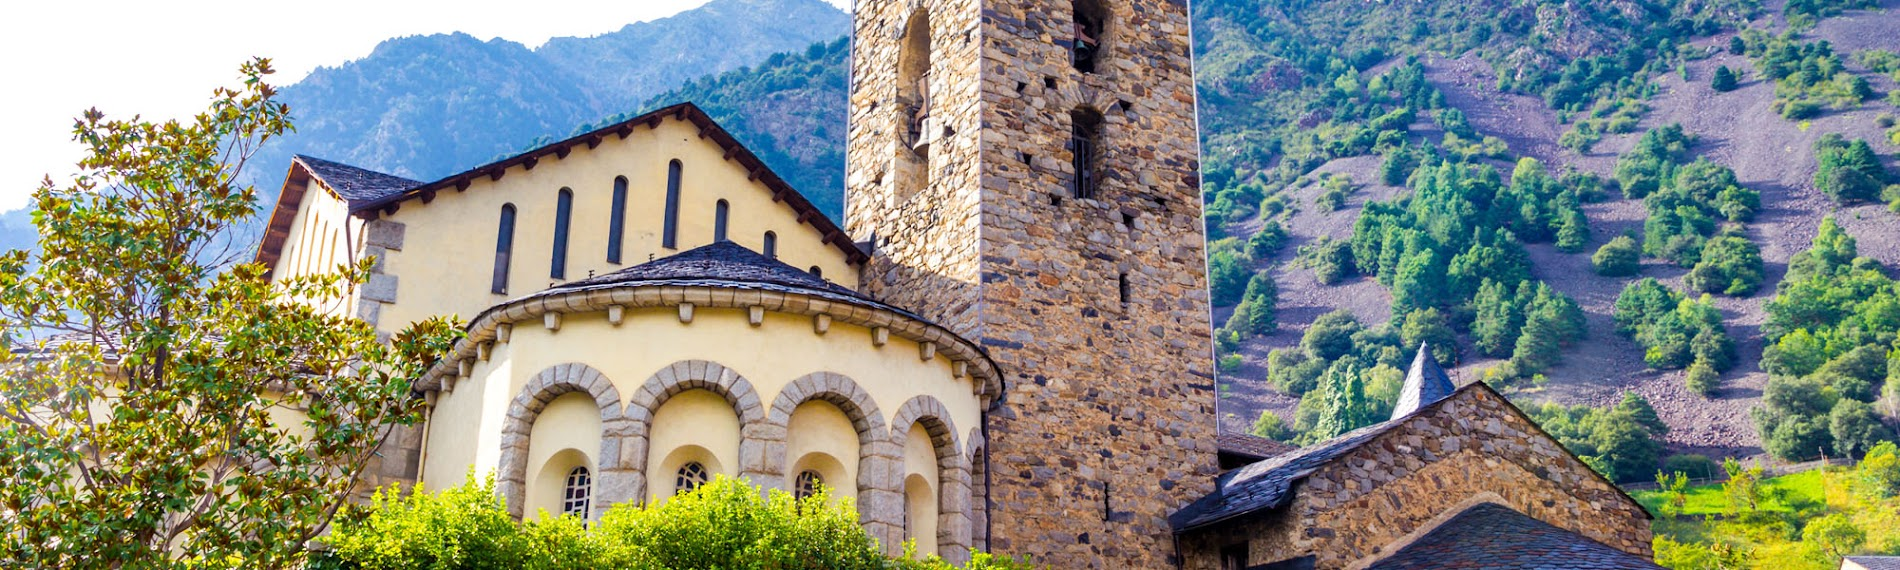 Igreja românica em Andorra la Vella